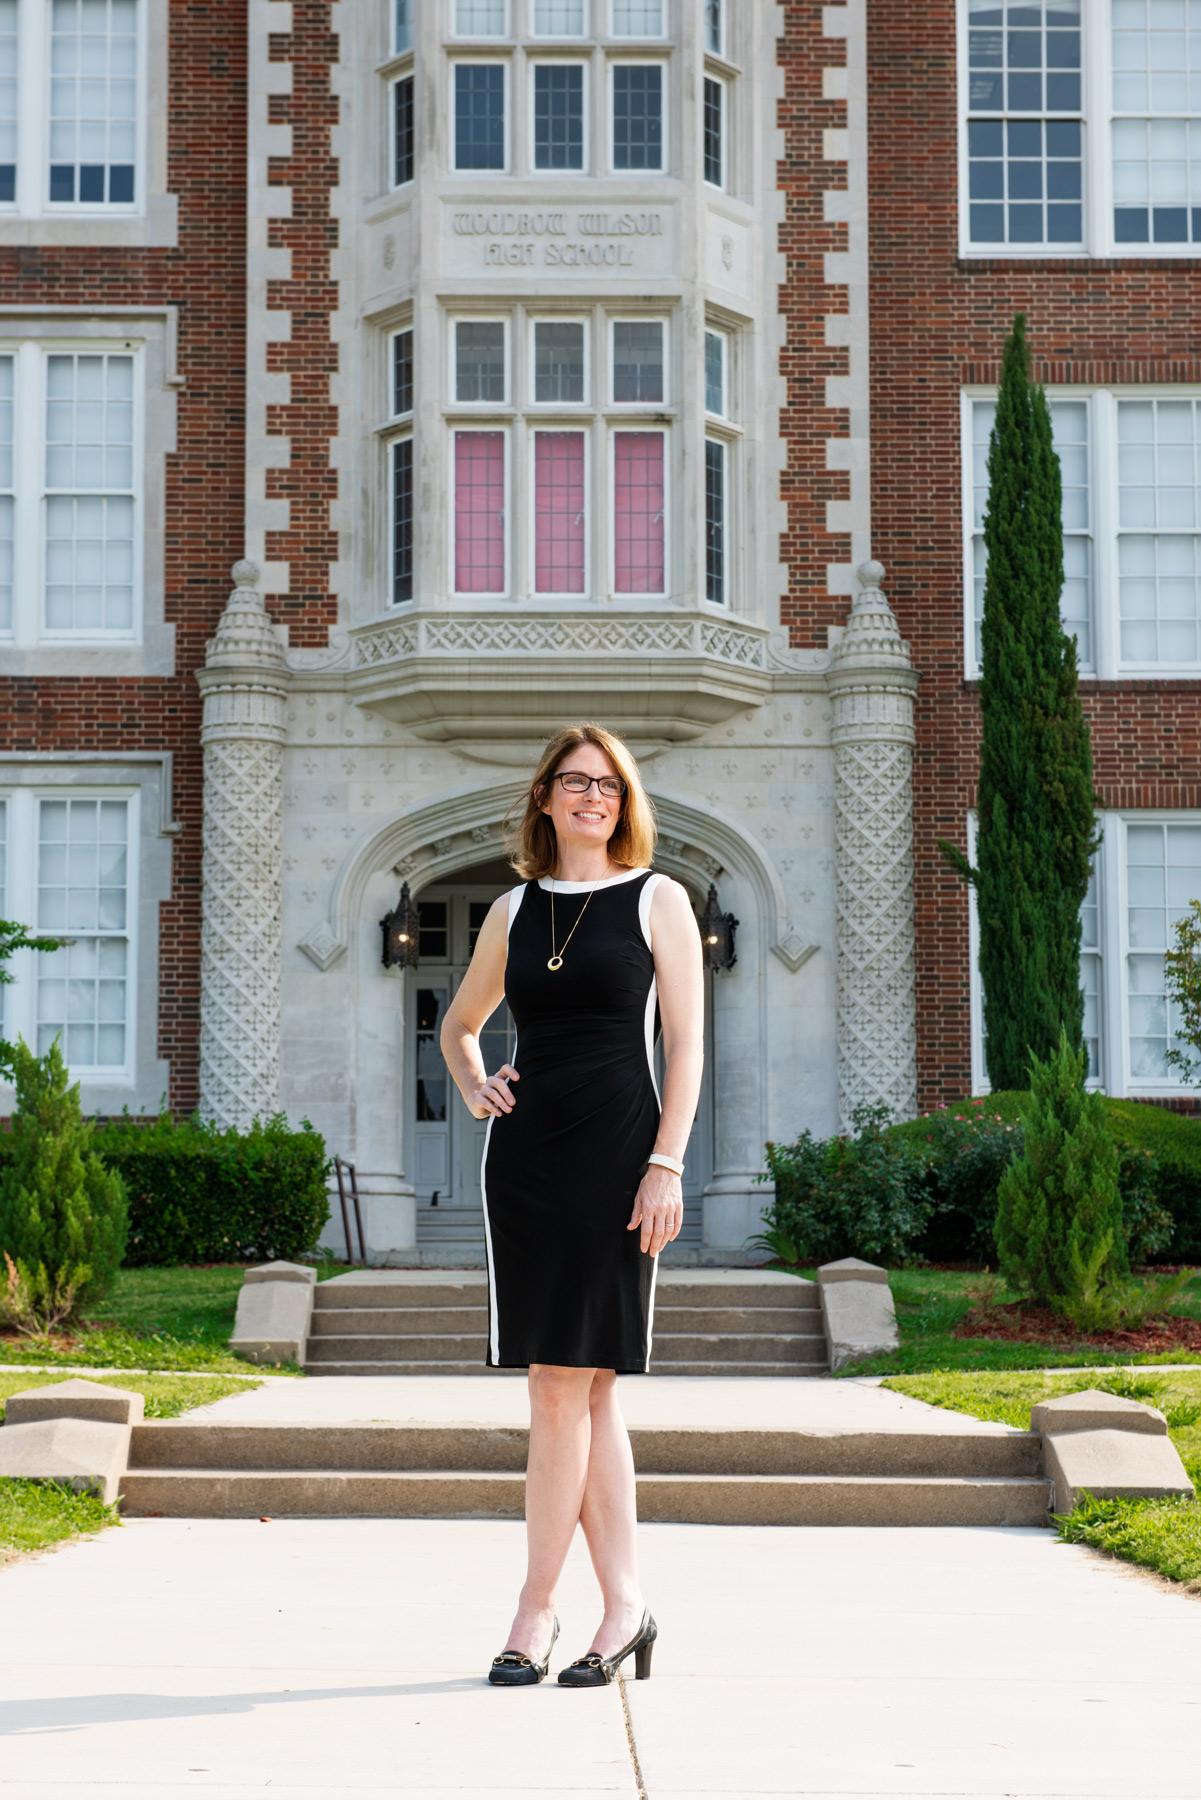 Lara Johnson, outside Woodrow Wilson High School, where she was once a student. (Photo by Jonathan Zizzo)